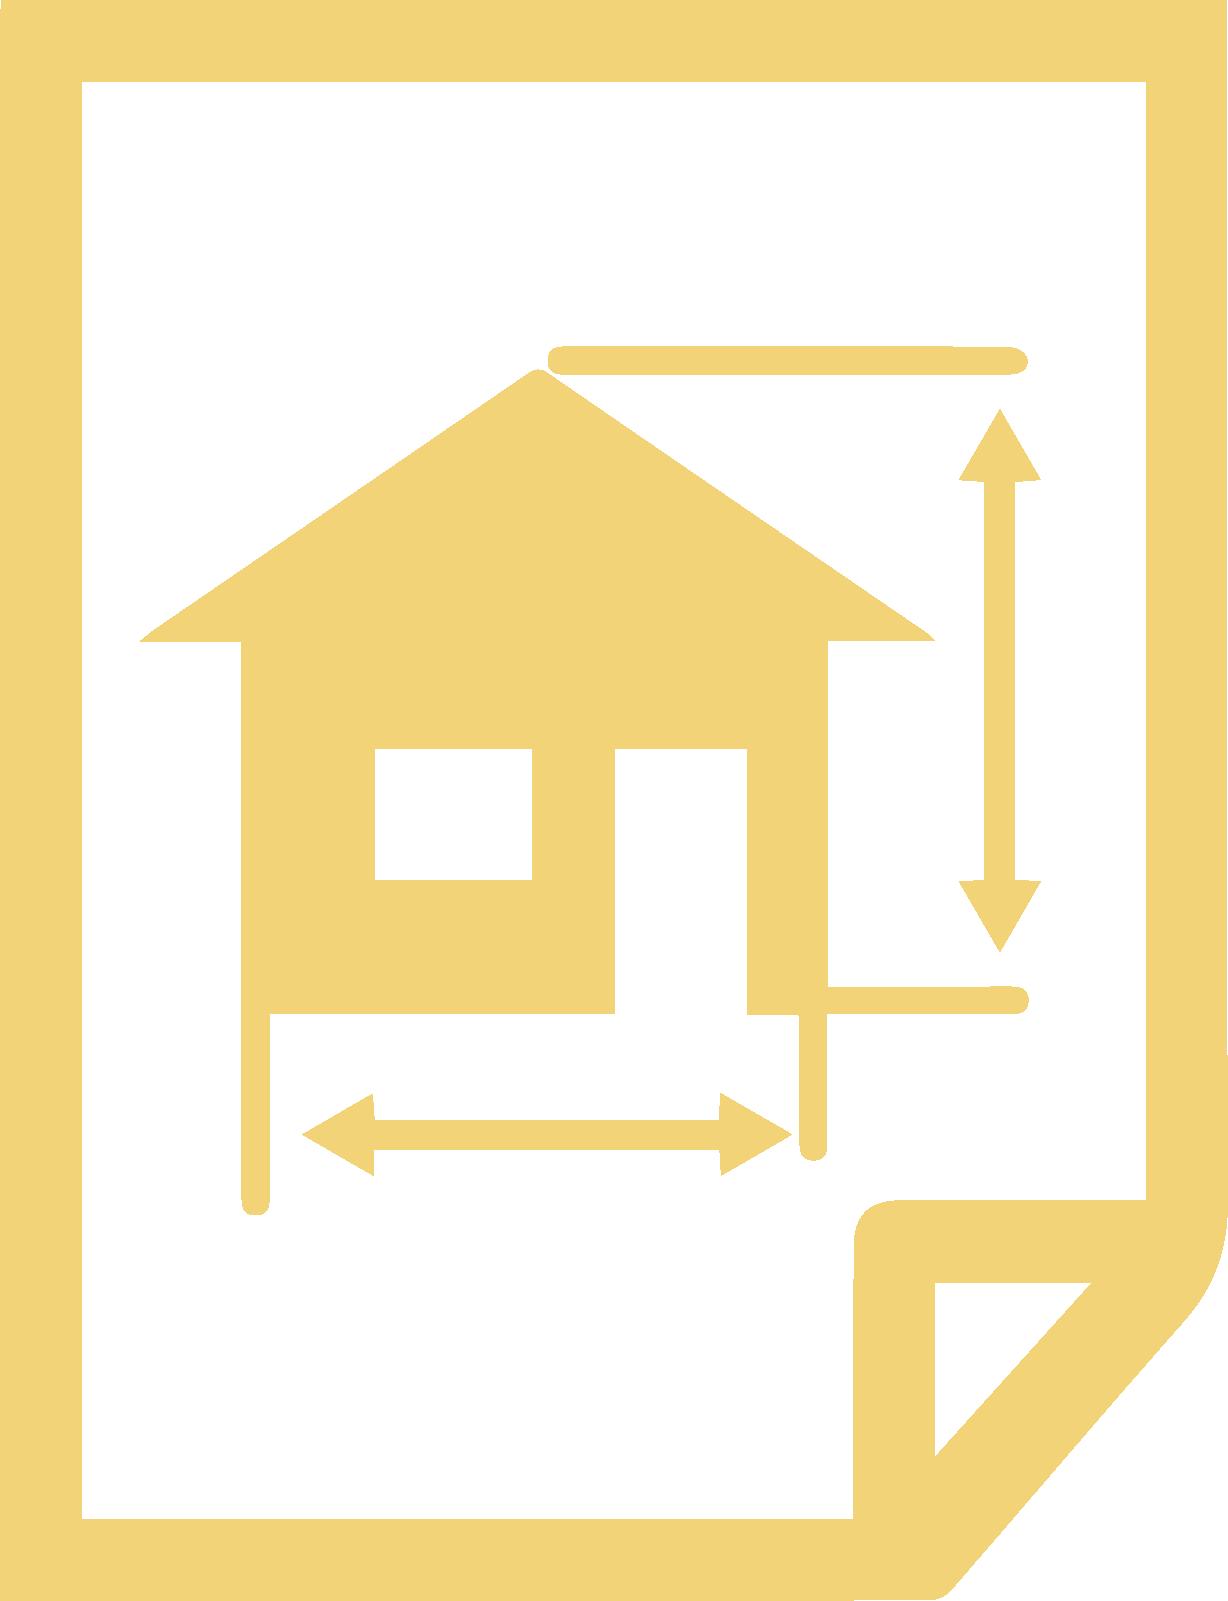 projet revendeur exaprint icone